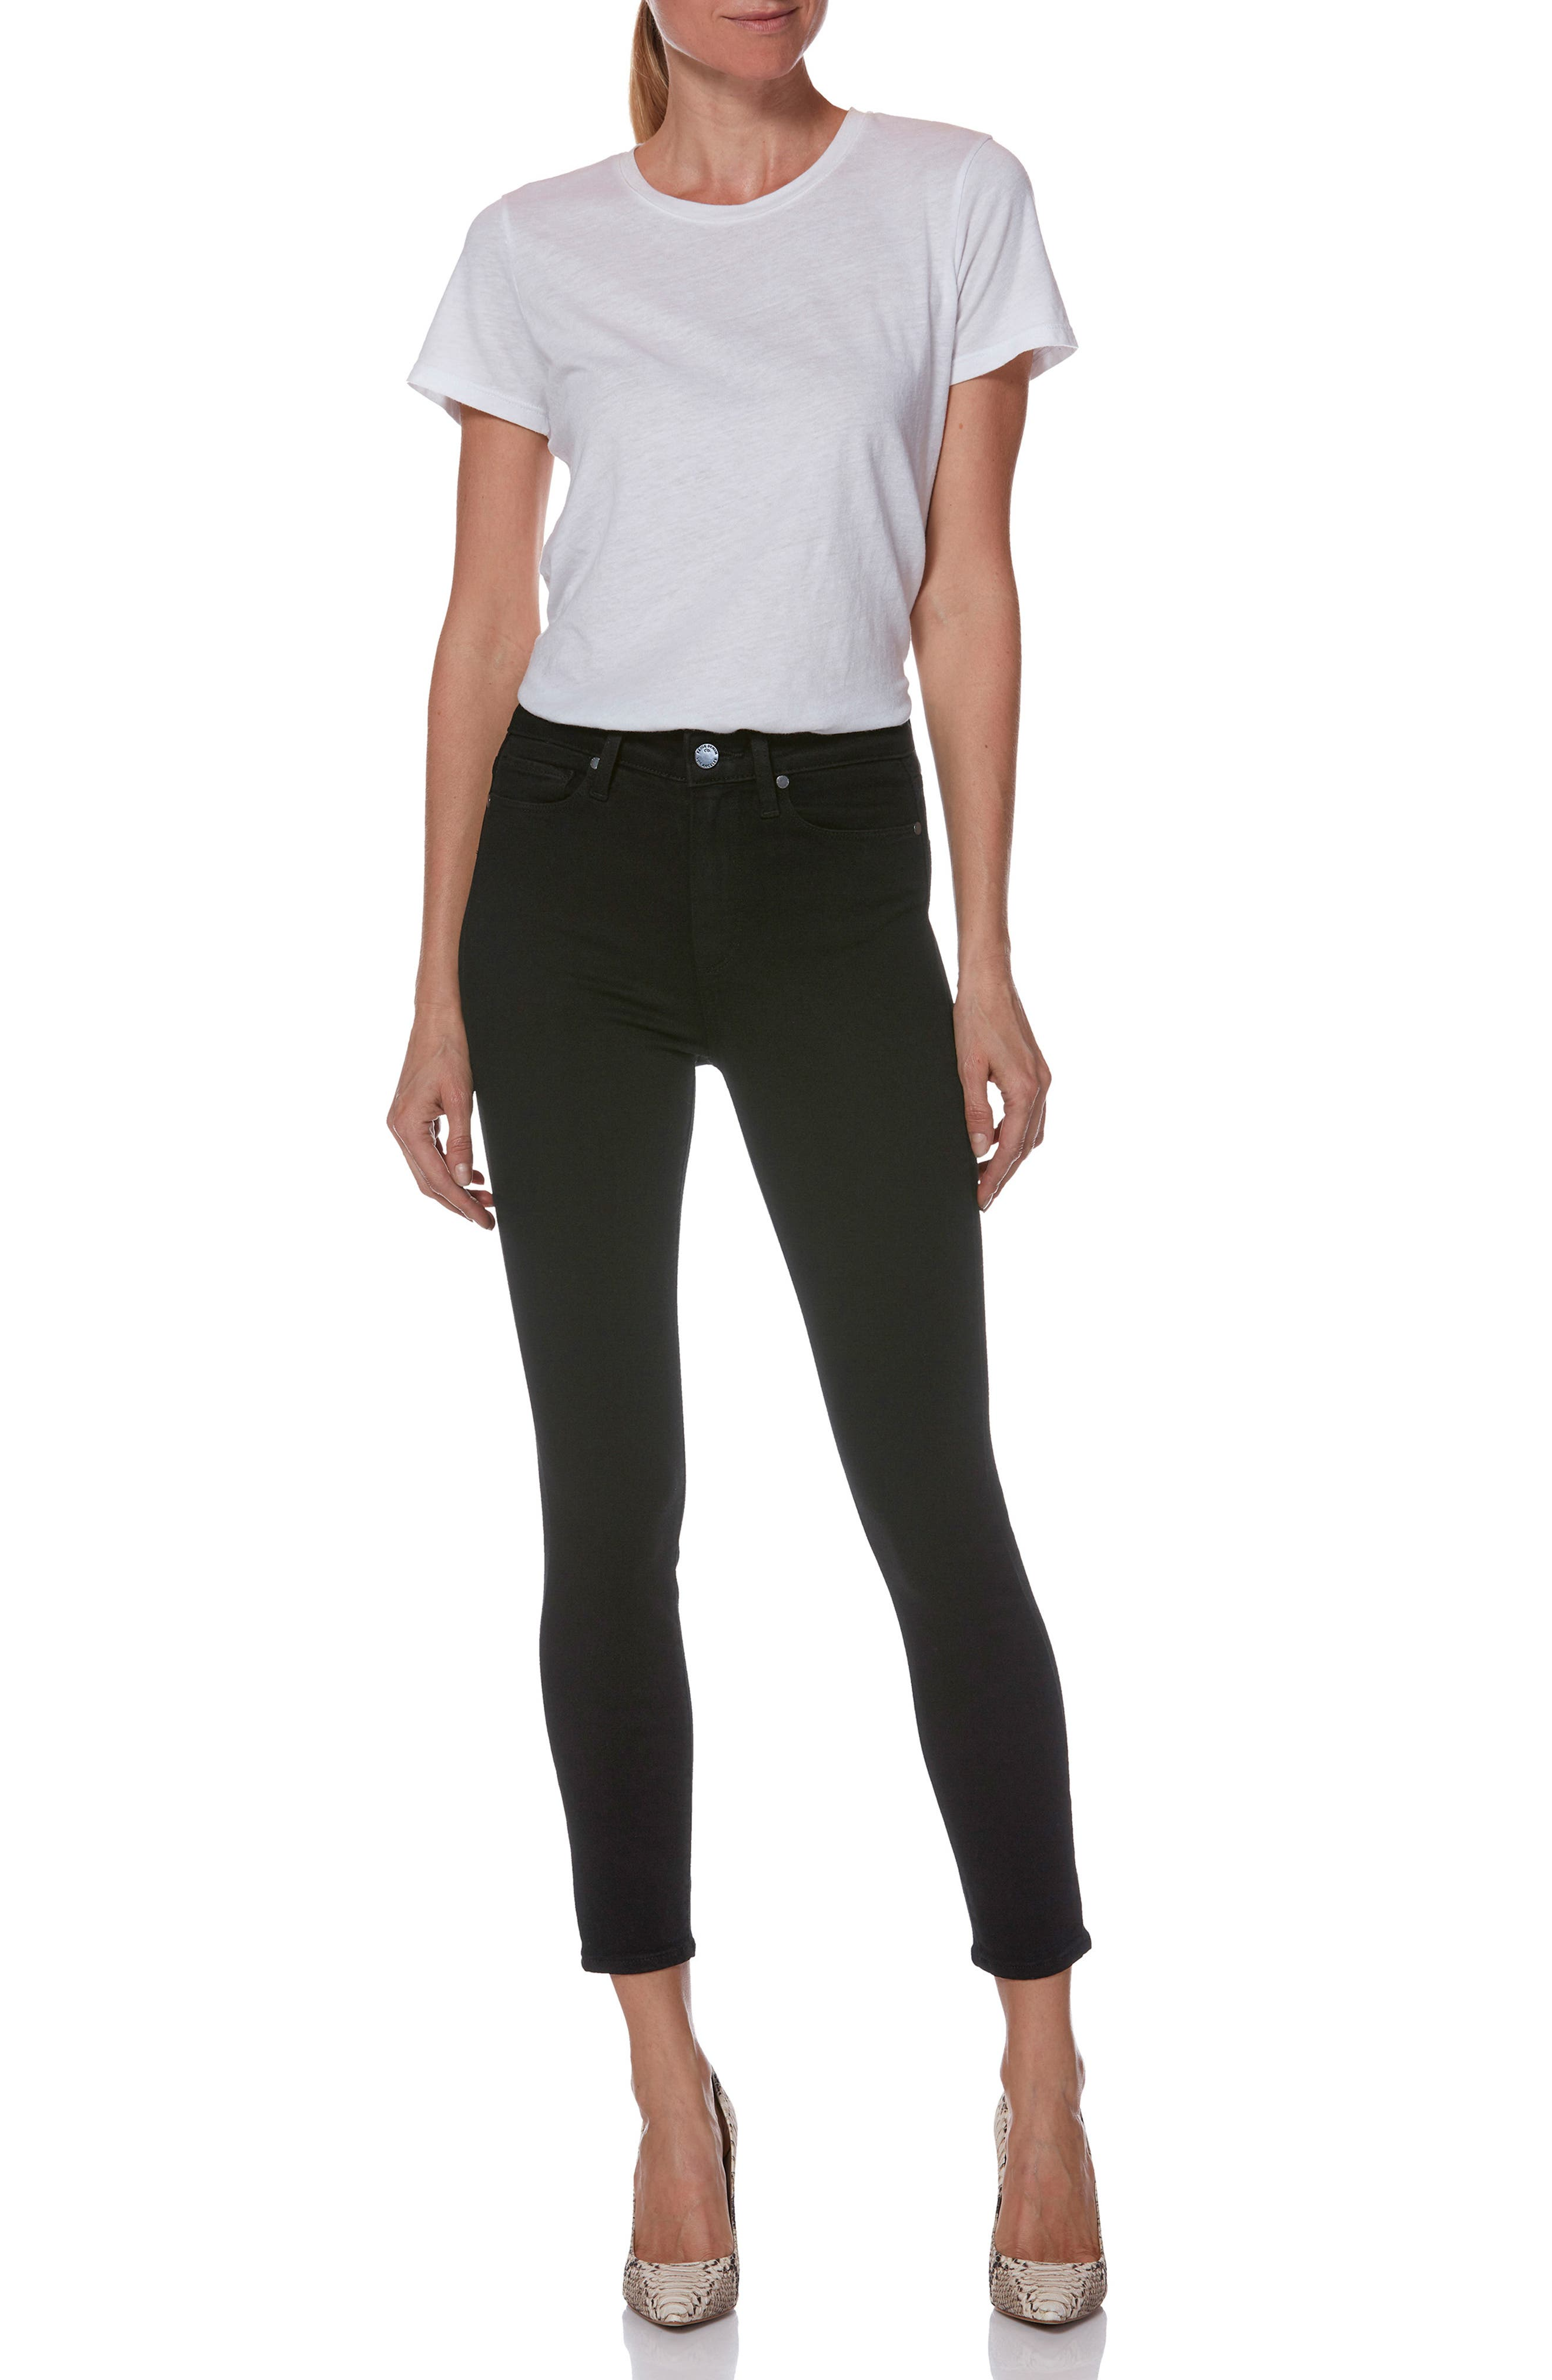 Transcend - Margot High Waist Crop Ultra Skinny Jeans,                             Alternate thumbnail 8, color,                             001